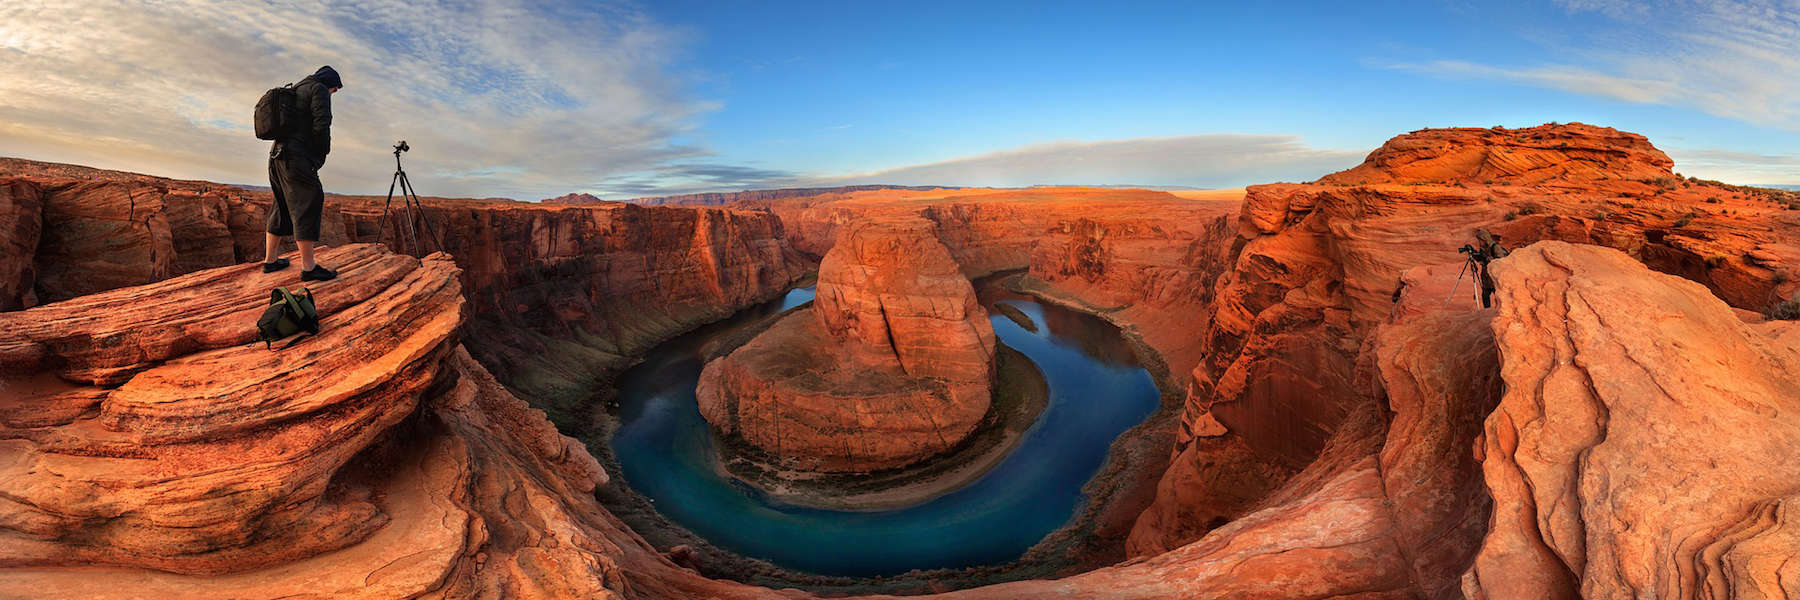 5 Best Landscape Photography Instagram Accounts